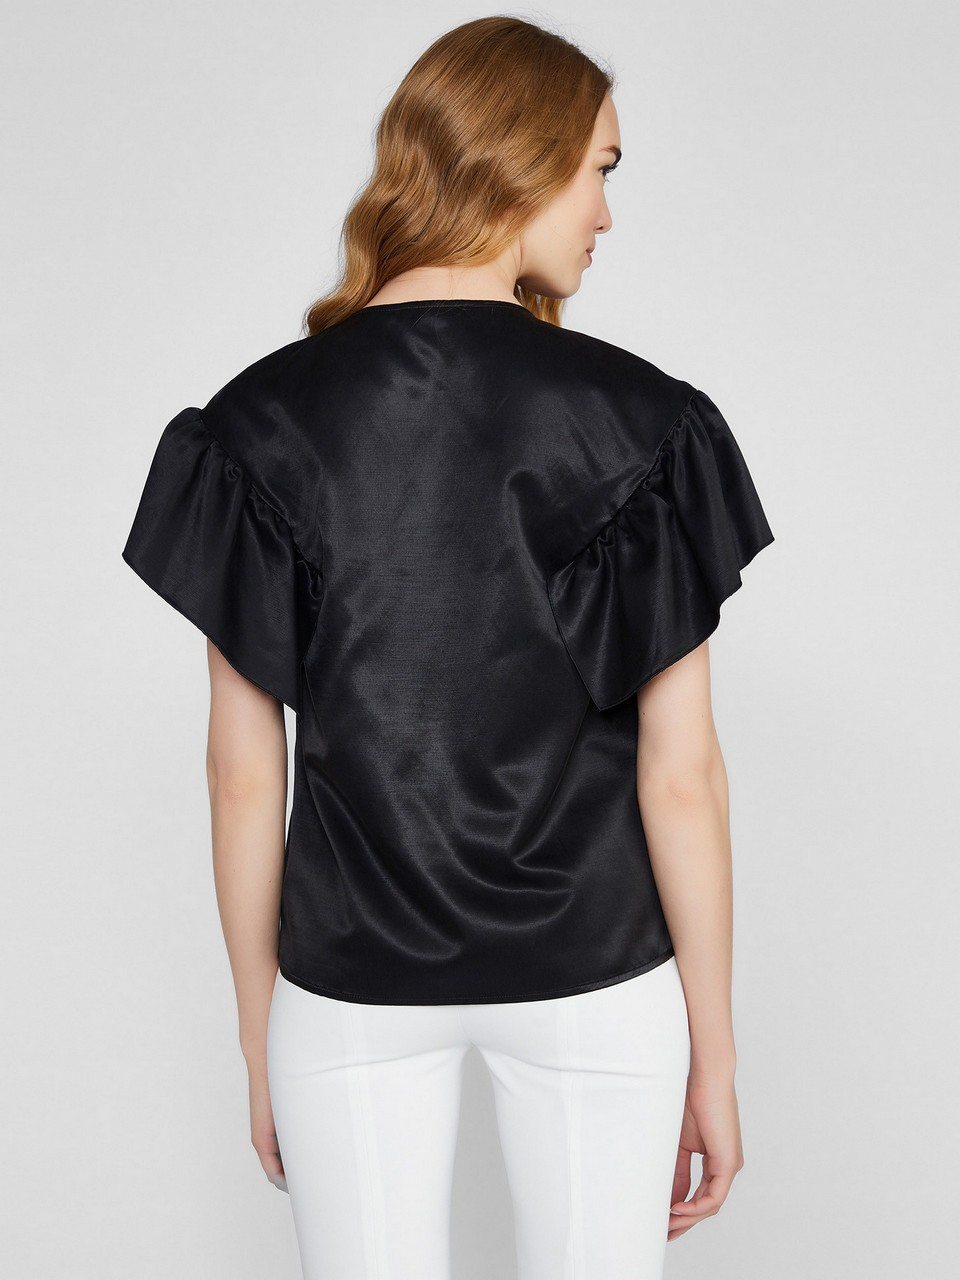 Volanlı Pamuk Kupra Bluz